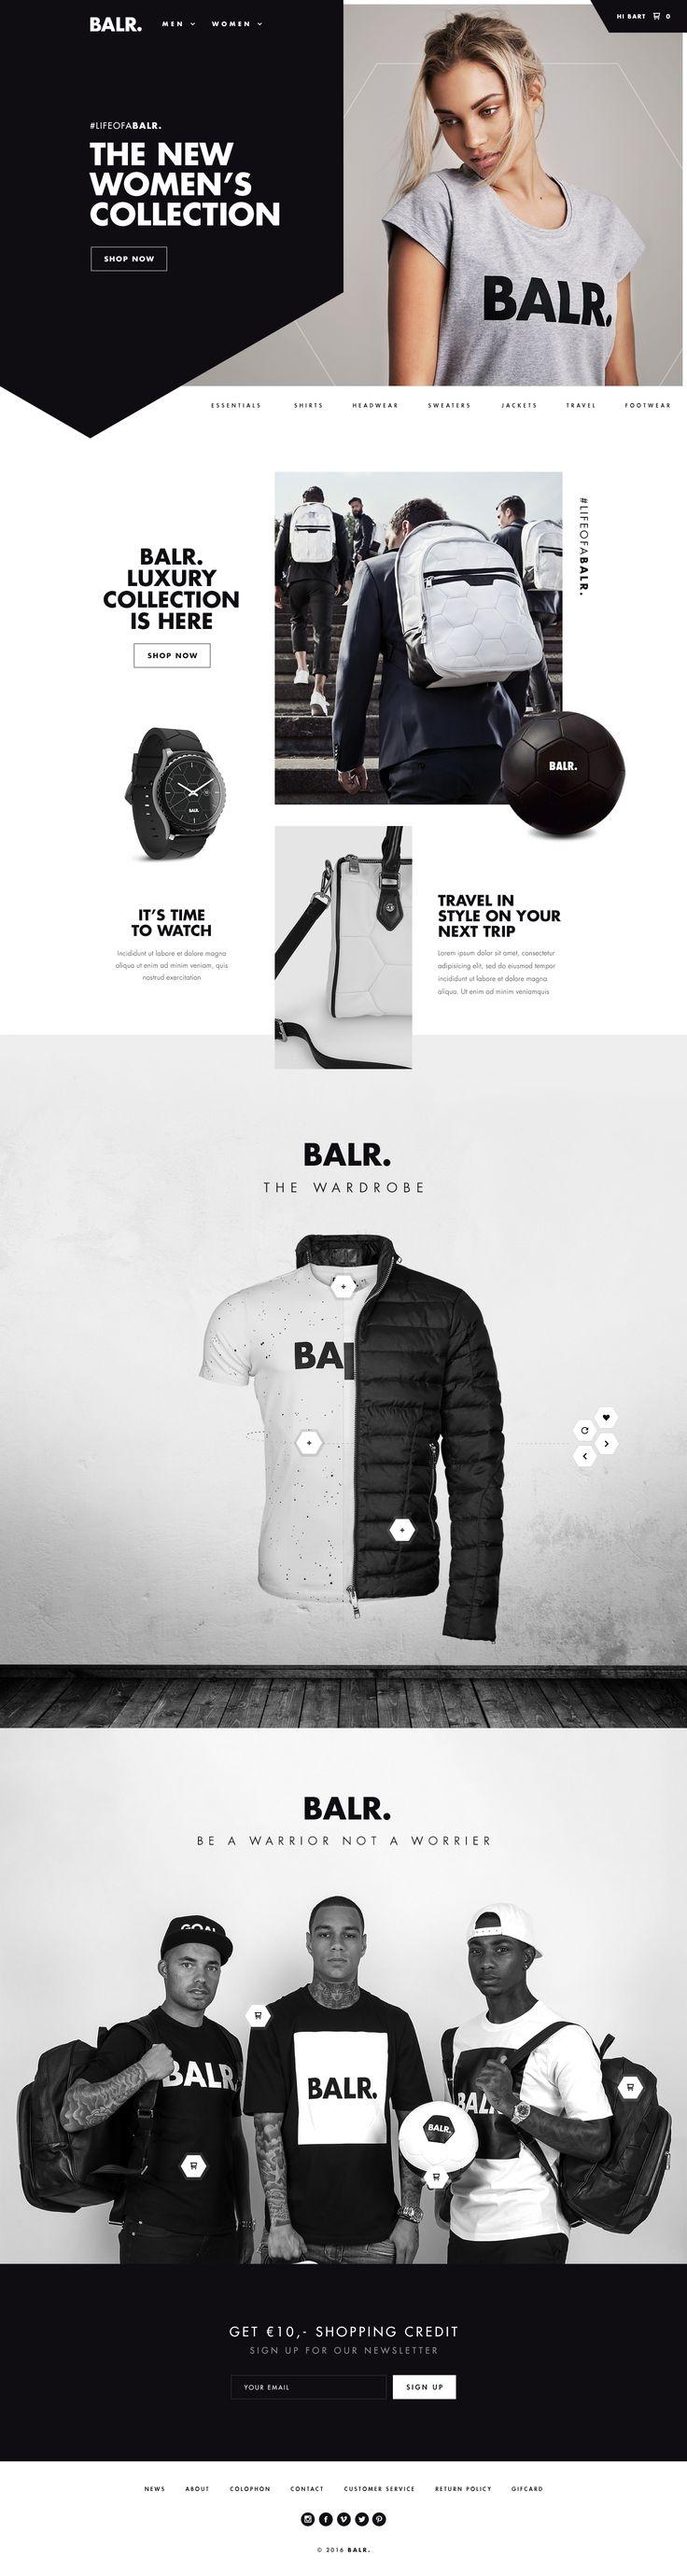 dbdfbfd1ab726f9548895e2b656dad22 web design layouts design concepts best 25 ecommerce website design ideas on pinterest ecommerce,E Commerce Womens Clothing